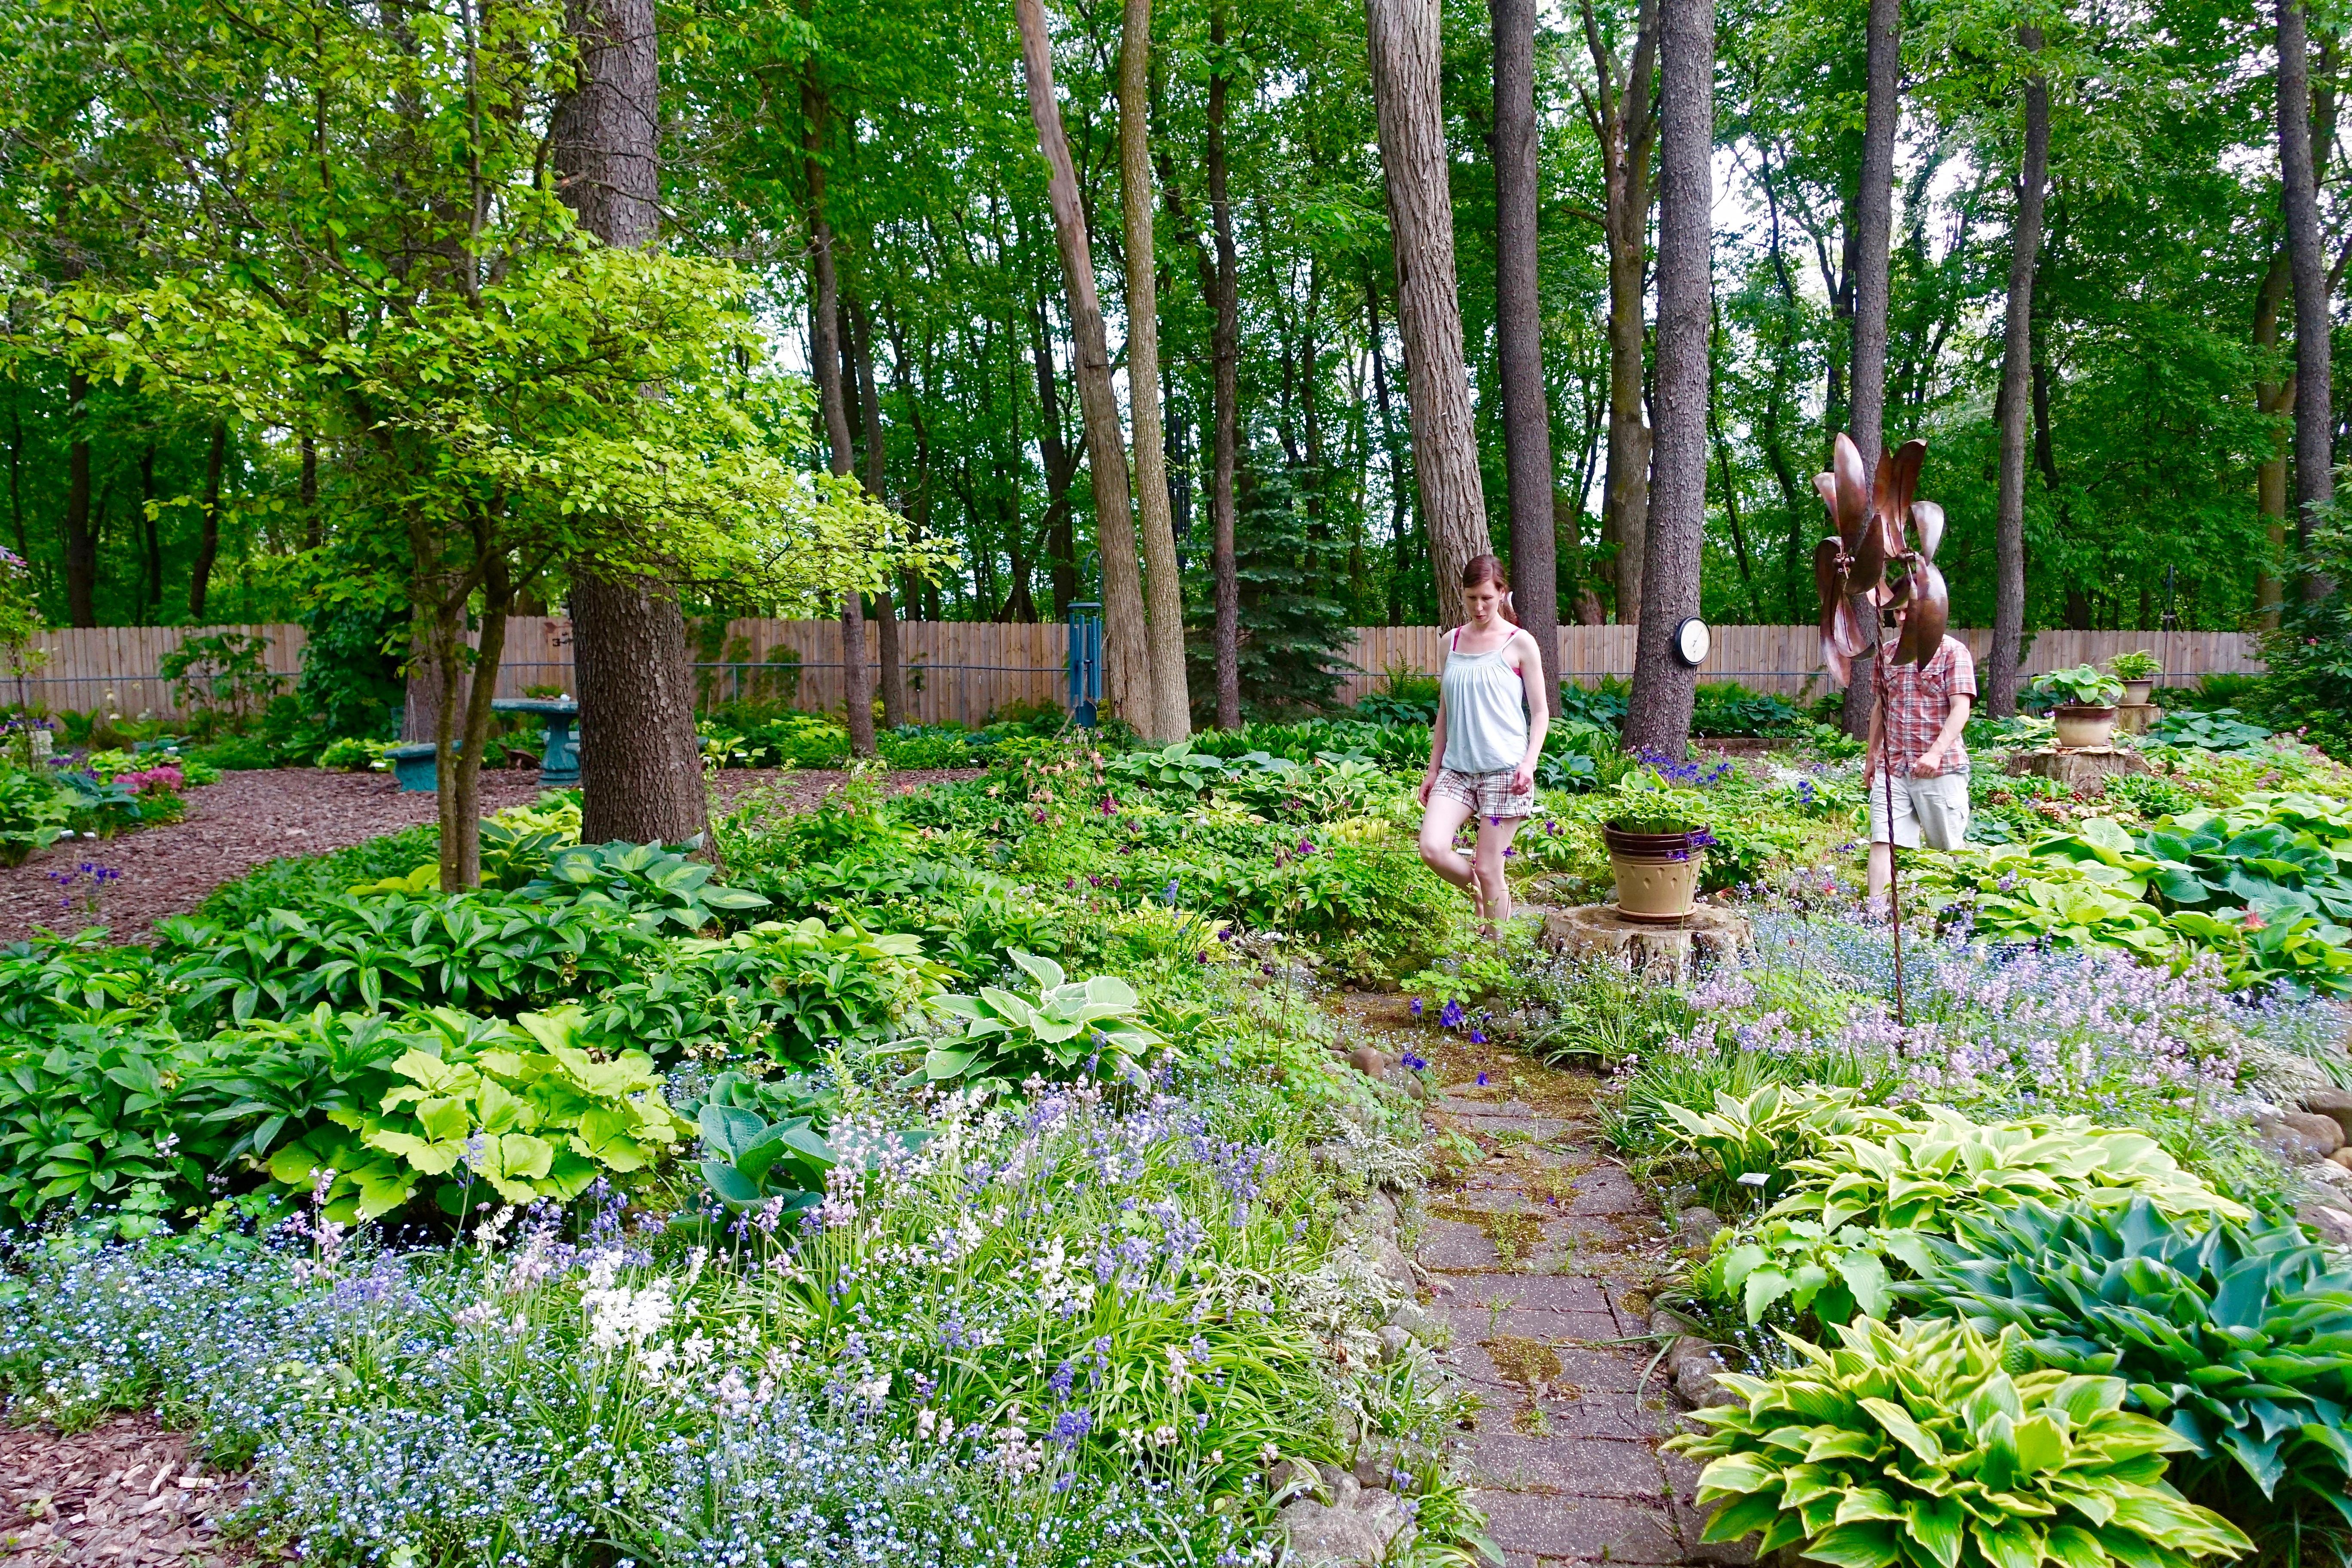 Dan and Brianna in Hosta Garden